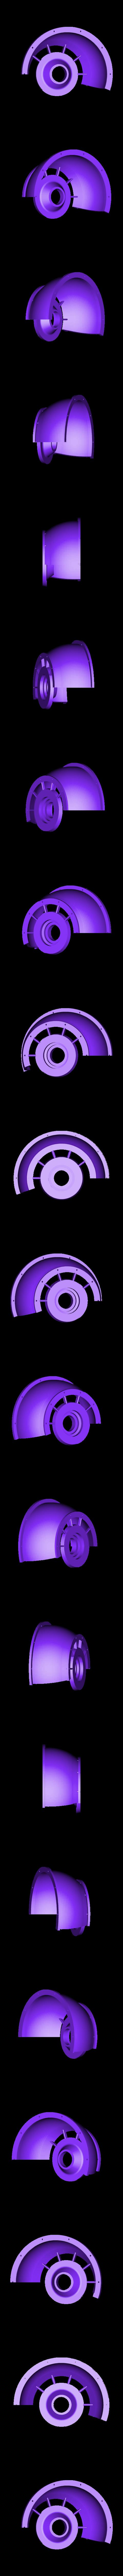 LPT-Inlet-Case01.stl Download free STL file Jet Engine, 3-Spool • 3D printable object, konchan77